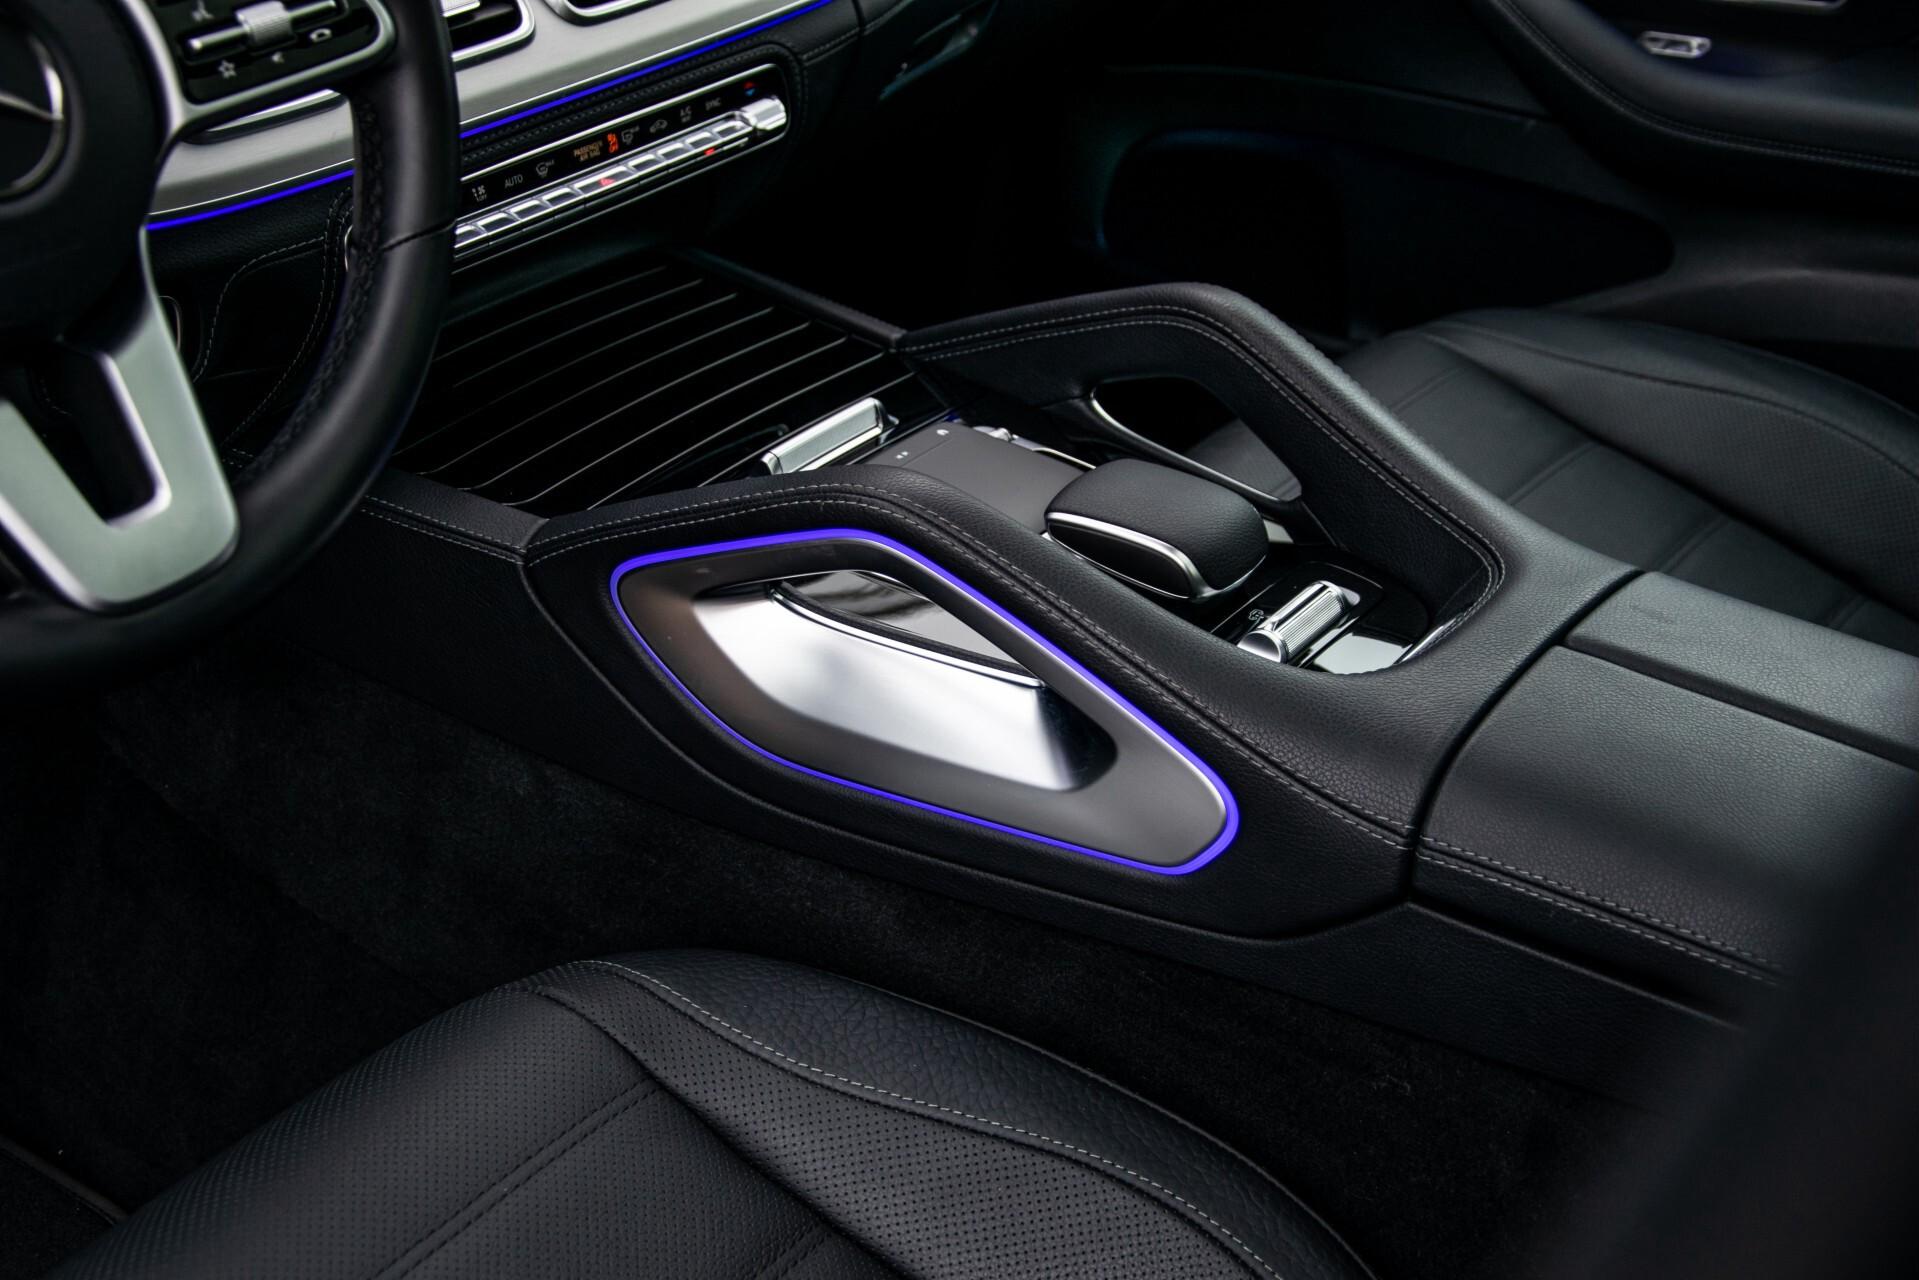 Mercedes-Benz GLE 450 4-M 7-Persoons AMG Massage/Rij-assist/Keyless/TV/360/Night/Trekhaak Aut9 Foto 21